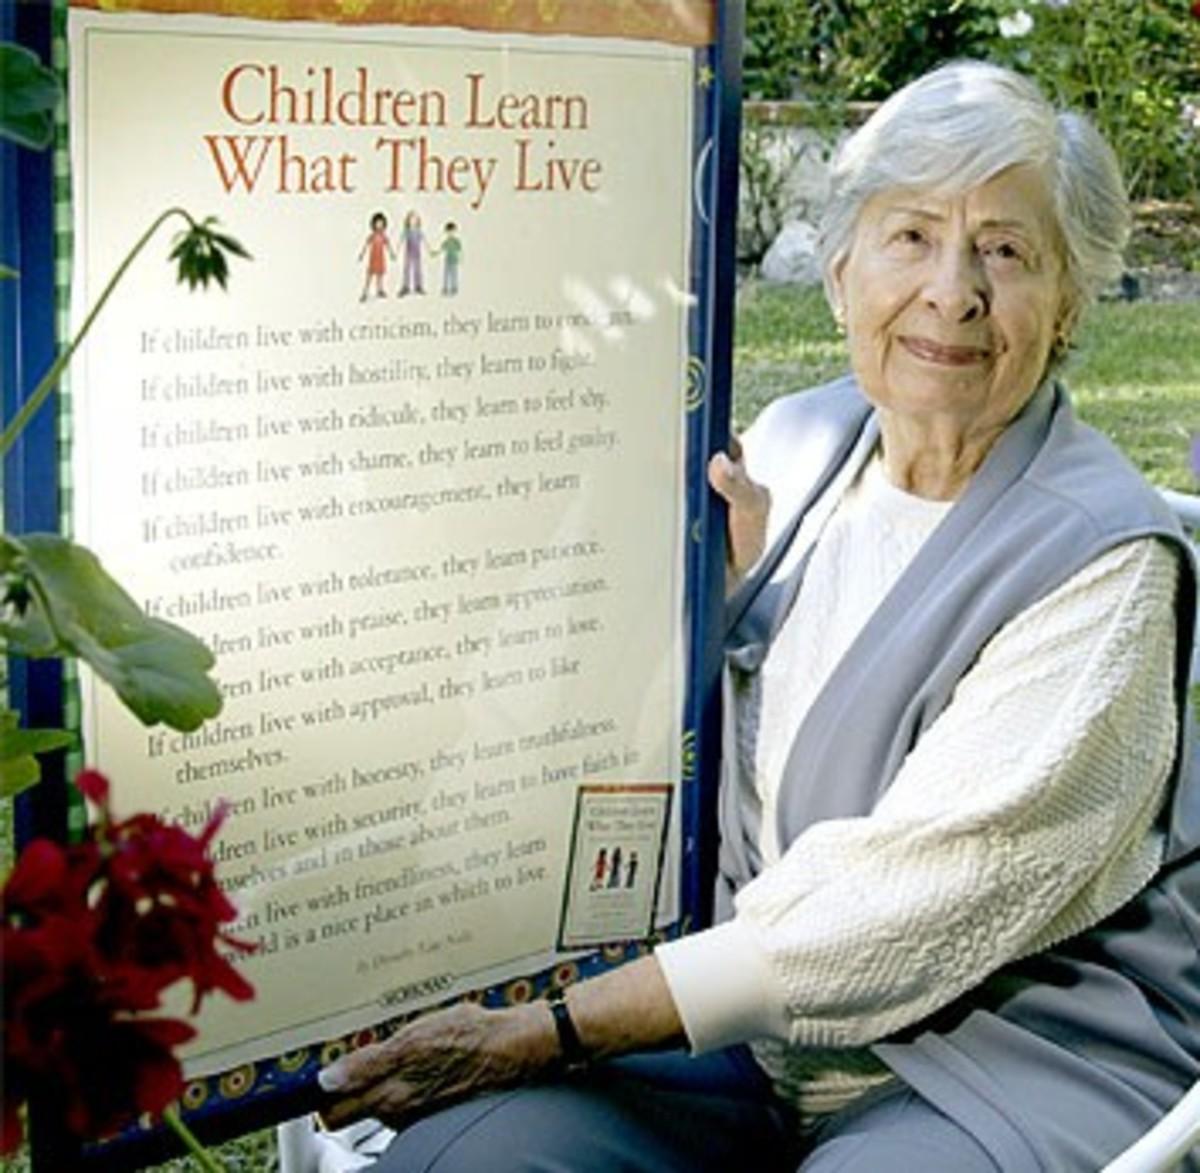 Dorothy Law Nolte (1924 - 2005)